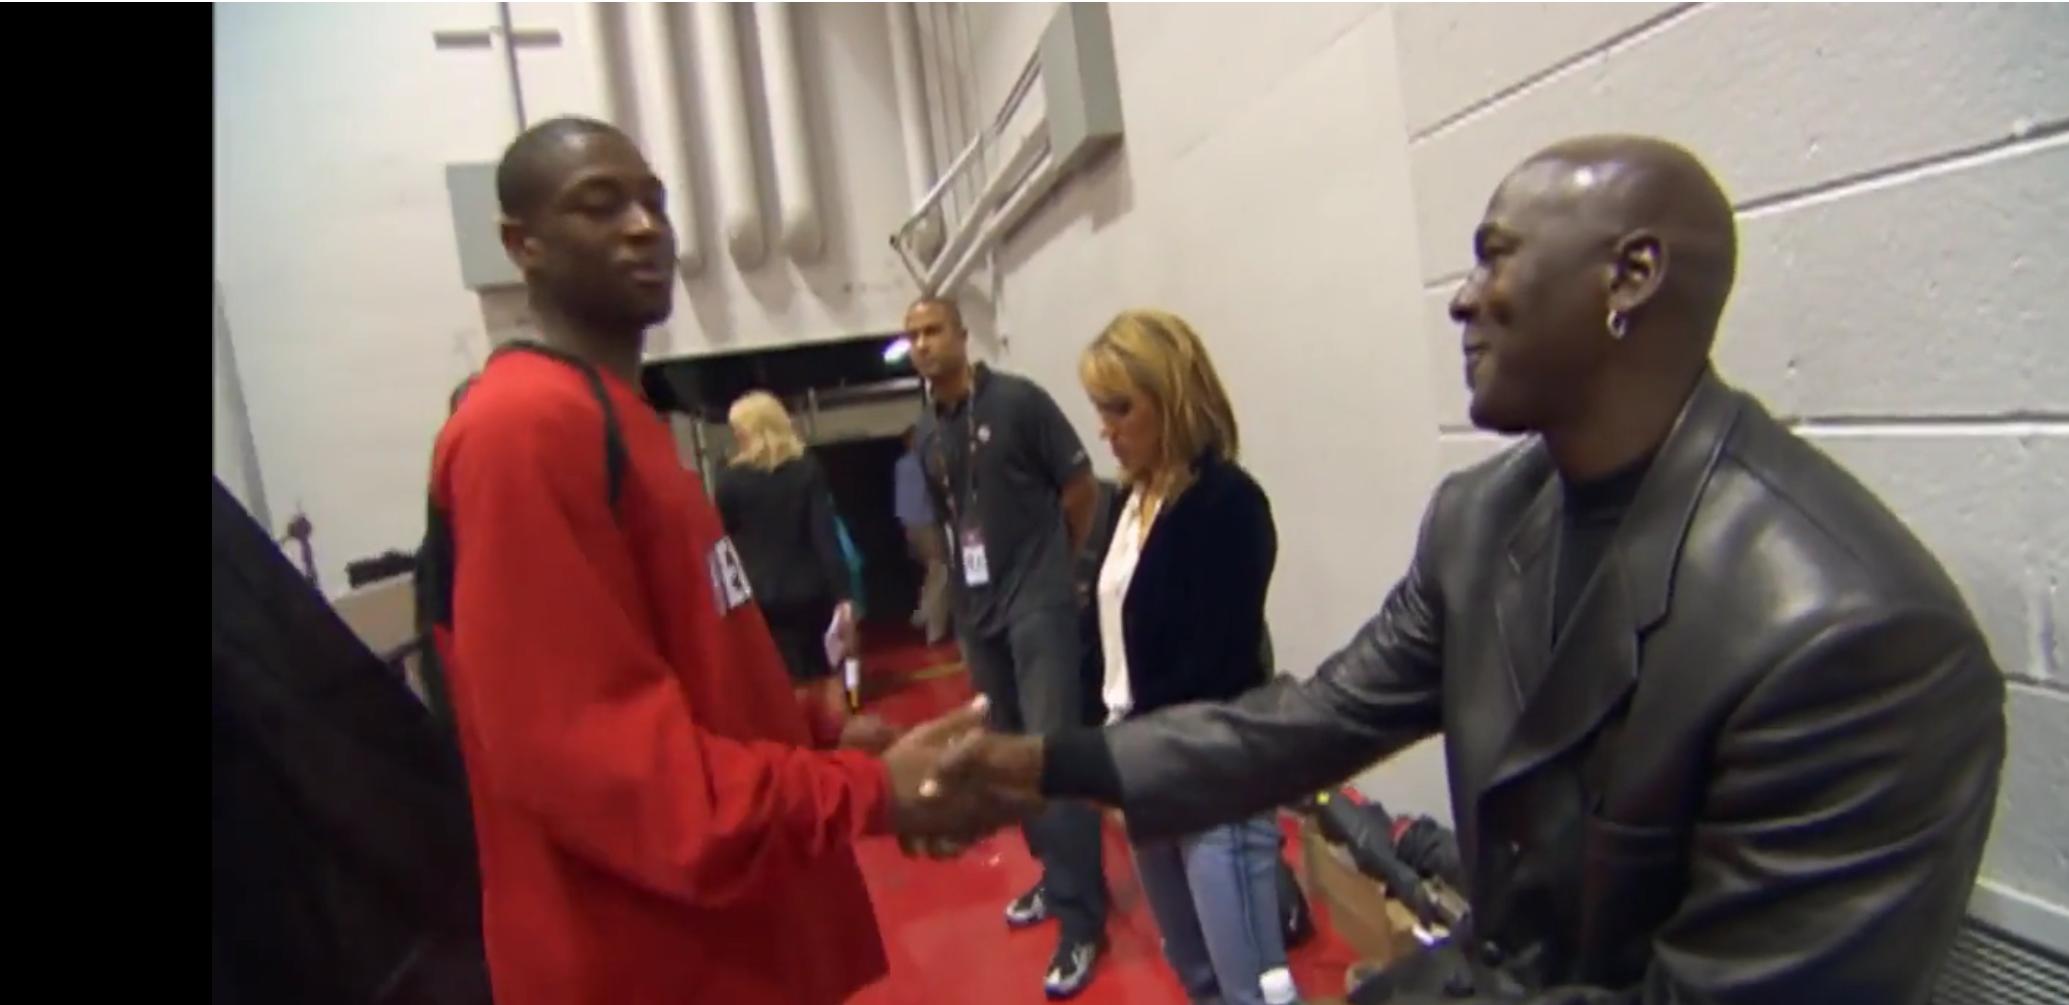 Dwyane Wade et l'influence de Michael Jordan